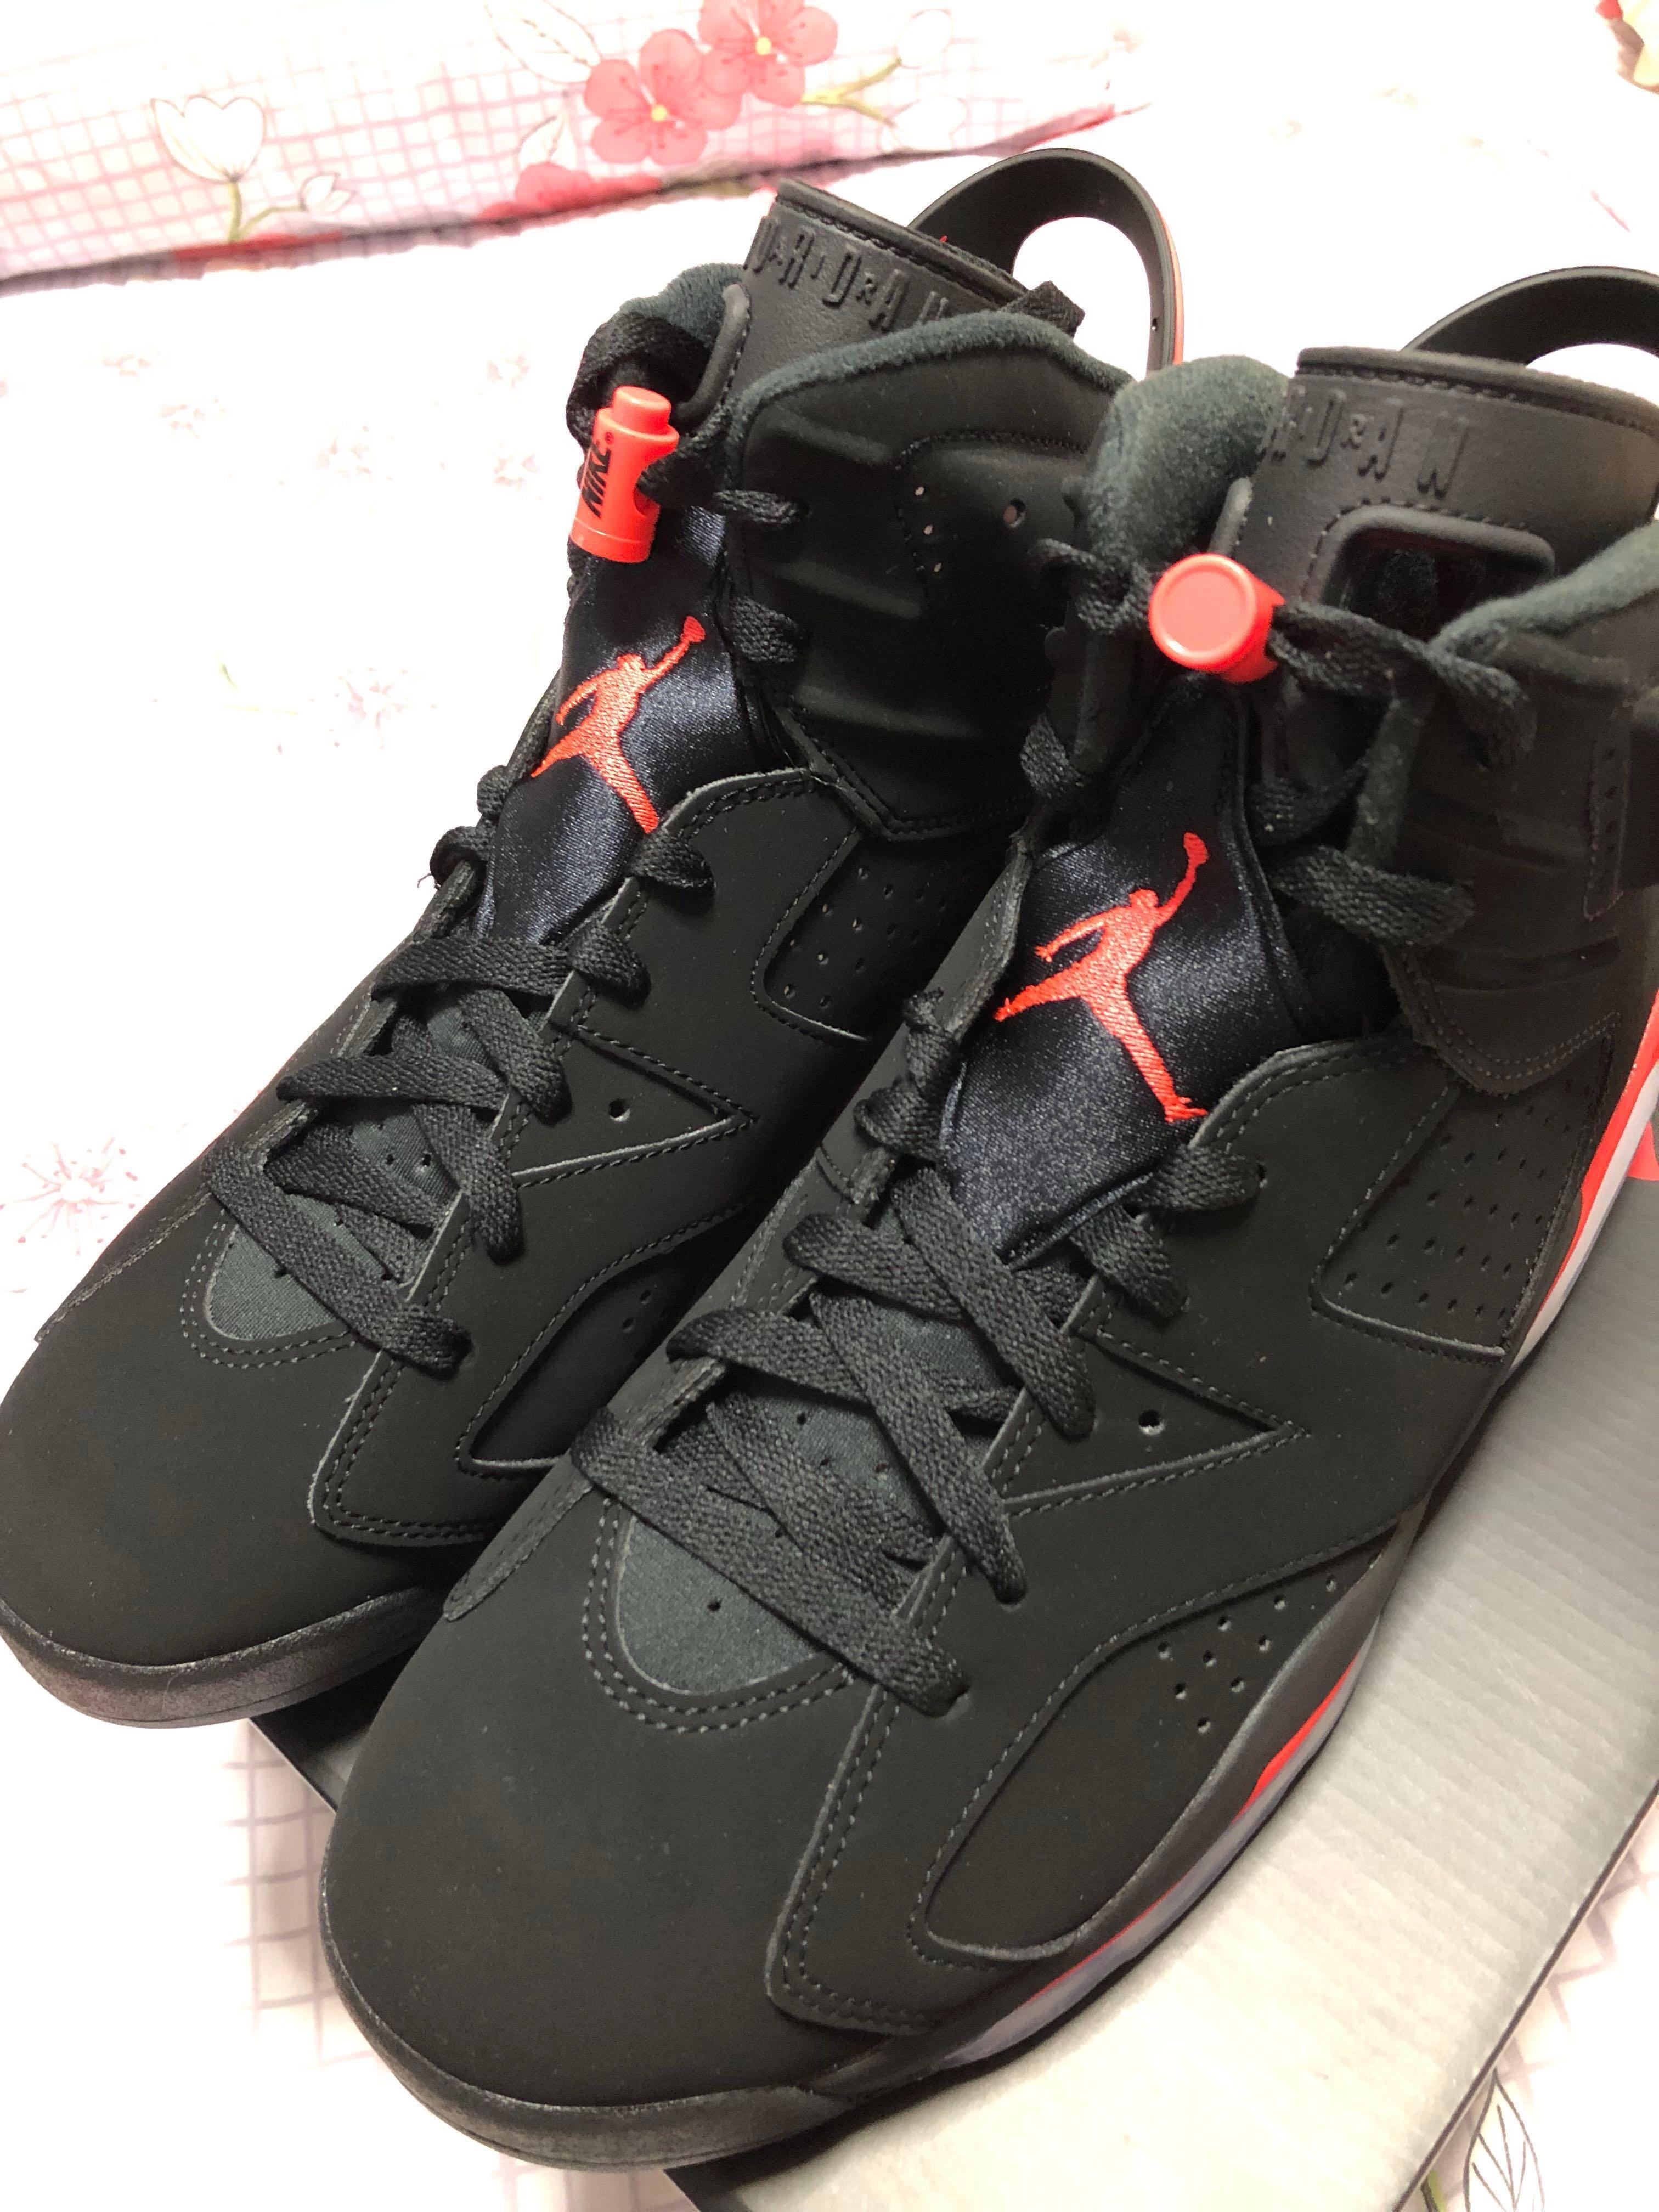 d8a05e3426e346 Air Jordan 6 Retro Black Infrared (2019) US 9.5